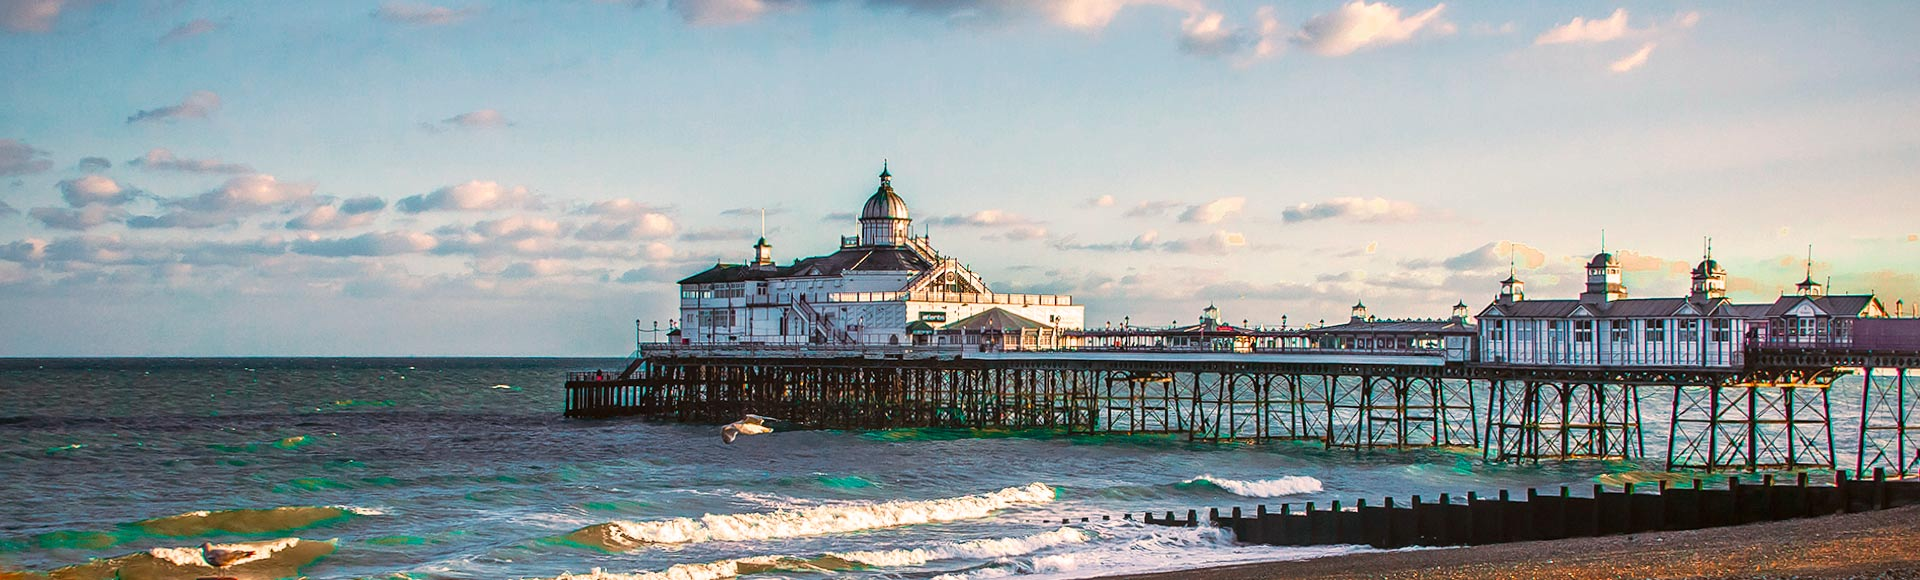 Cursos de inglés en Eastbourne 2017 – Curso de inglés en el extranjero